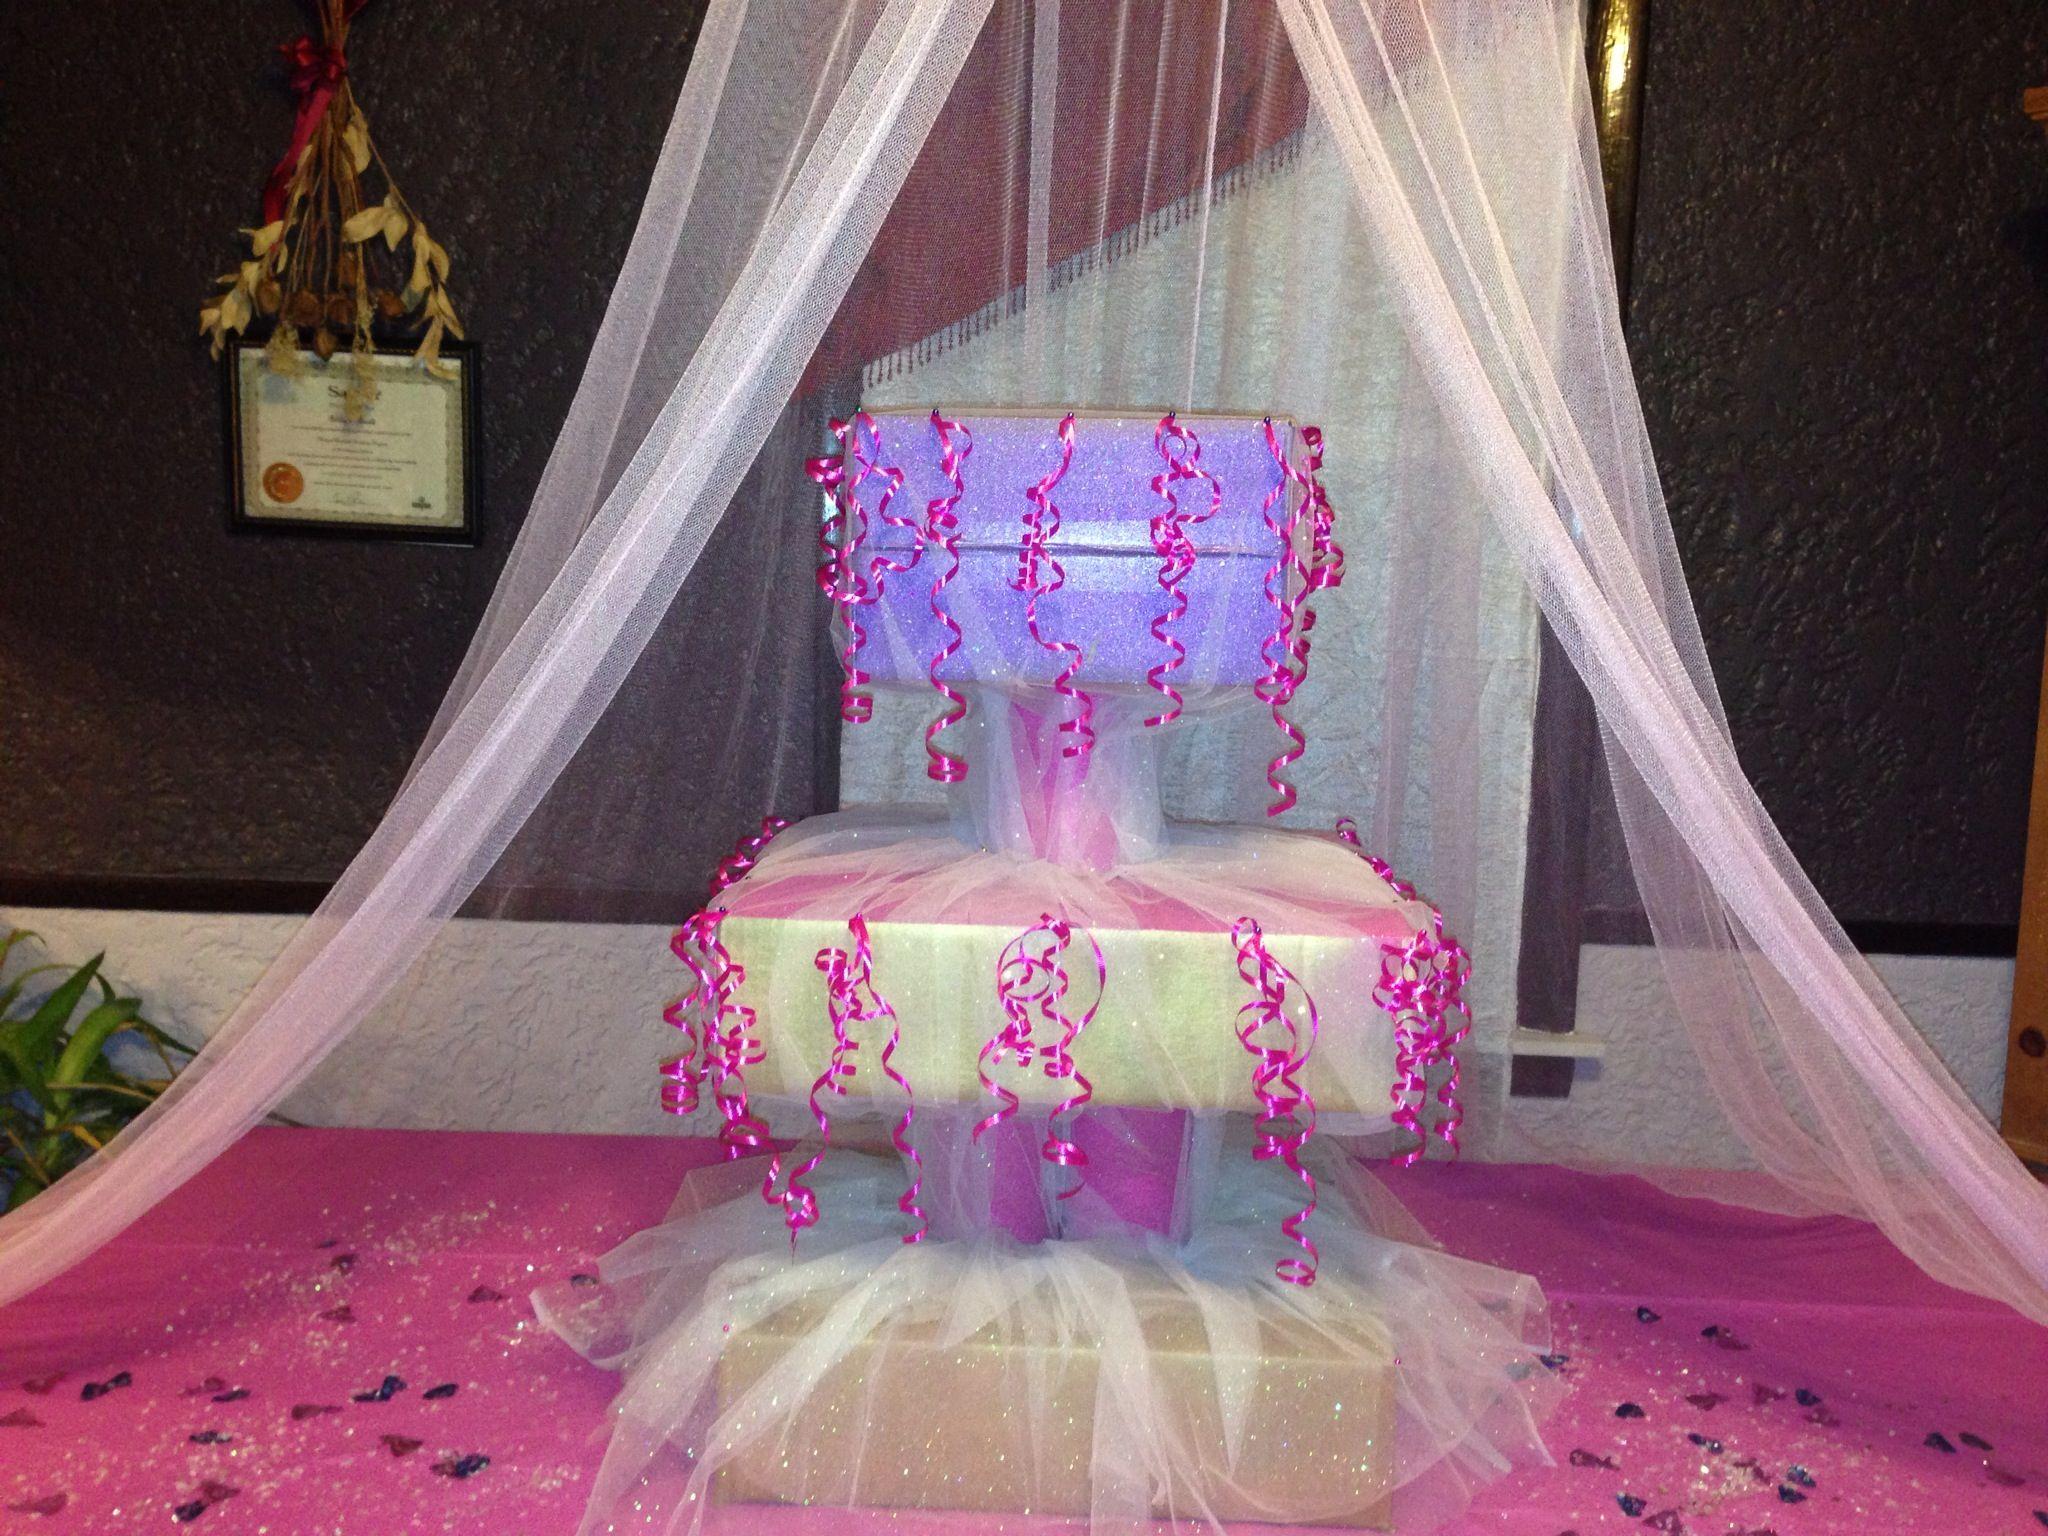 Homemade Cake Decorating Stand : Cupcake stand DIY Cake decorating ideas Pinterest